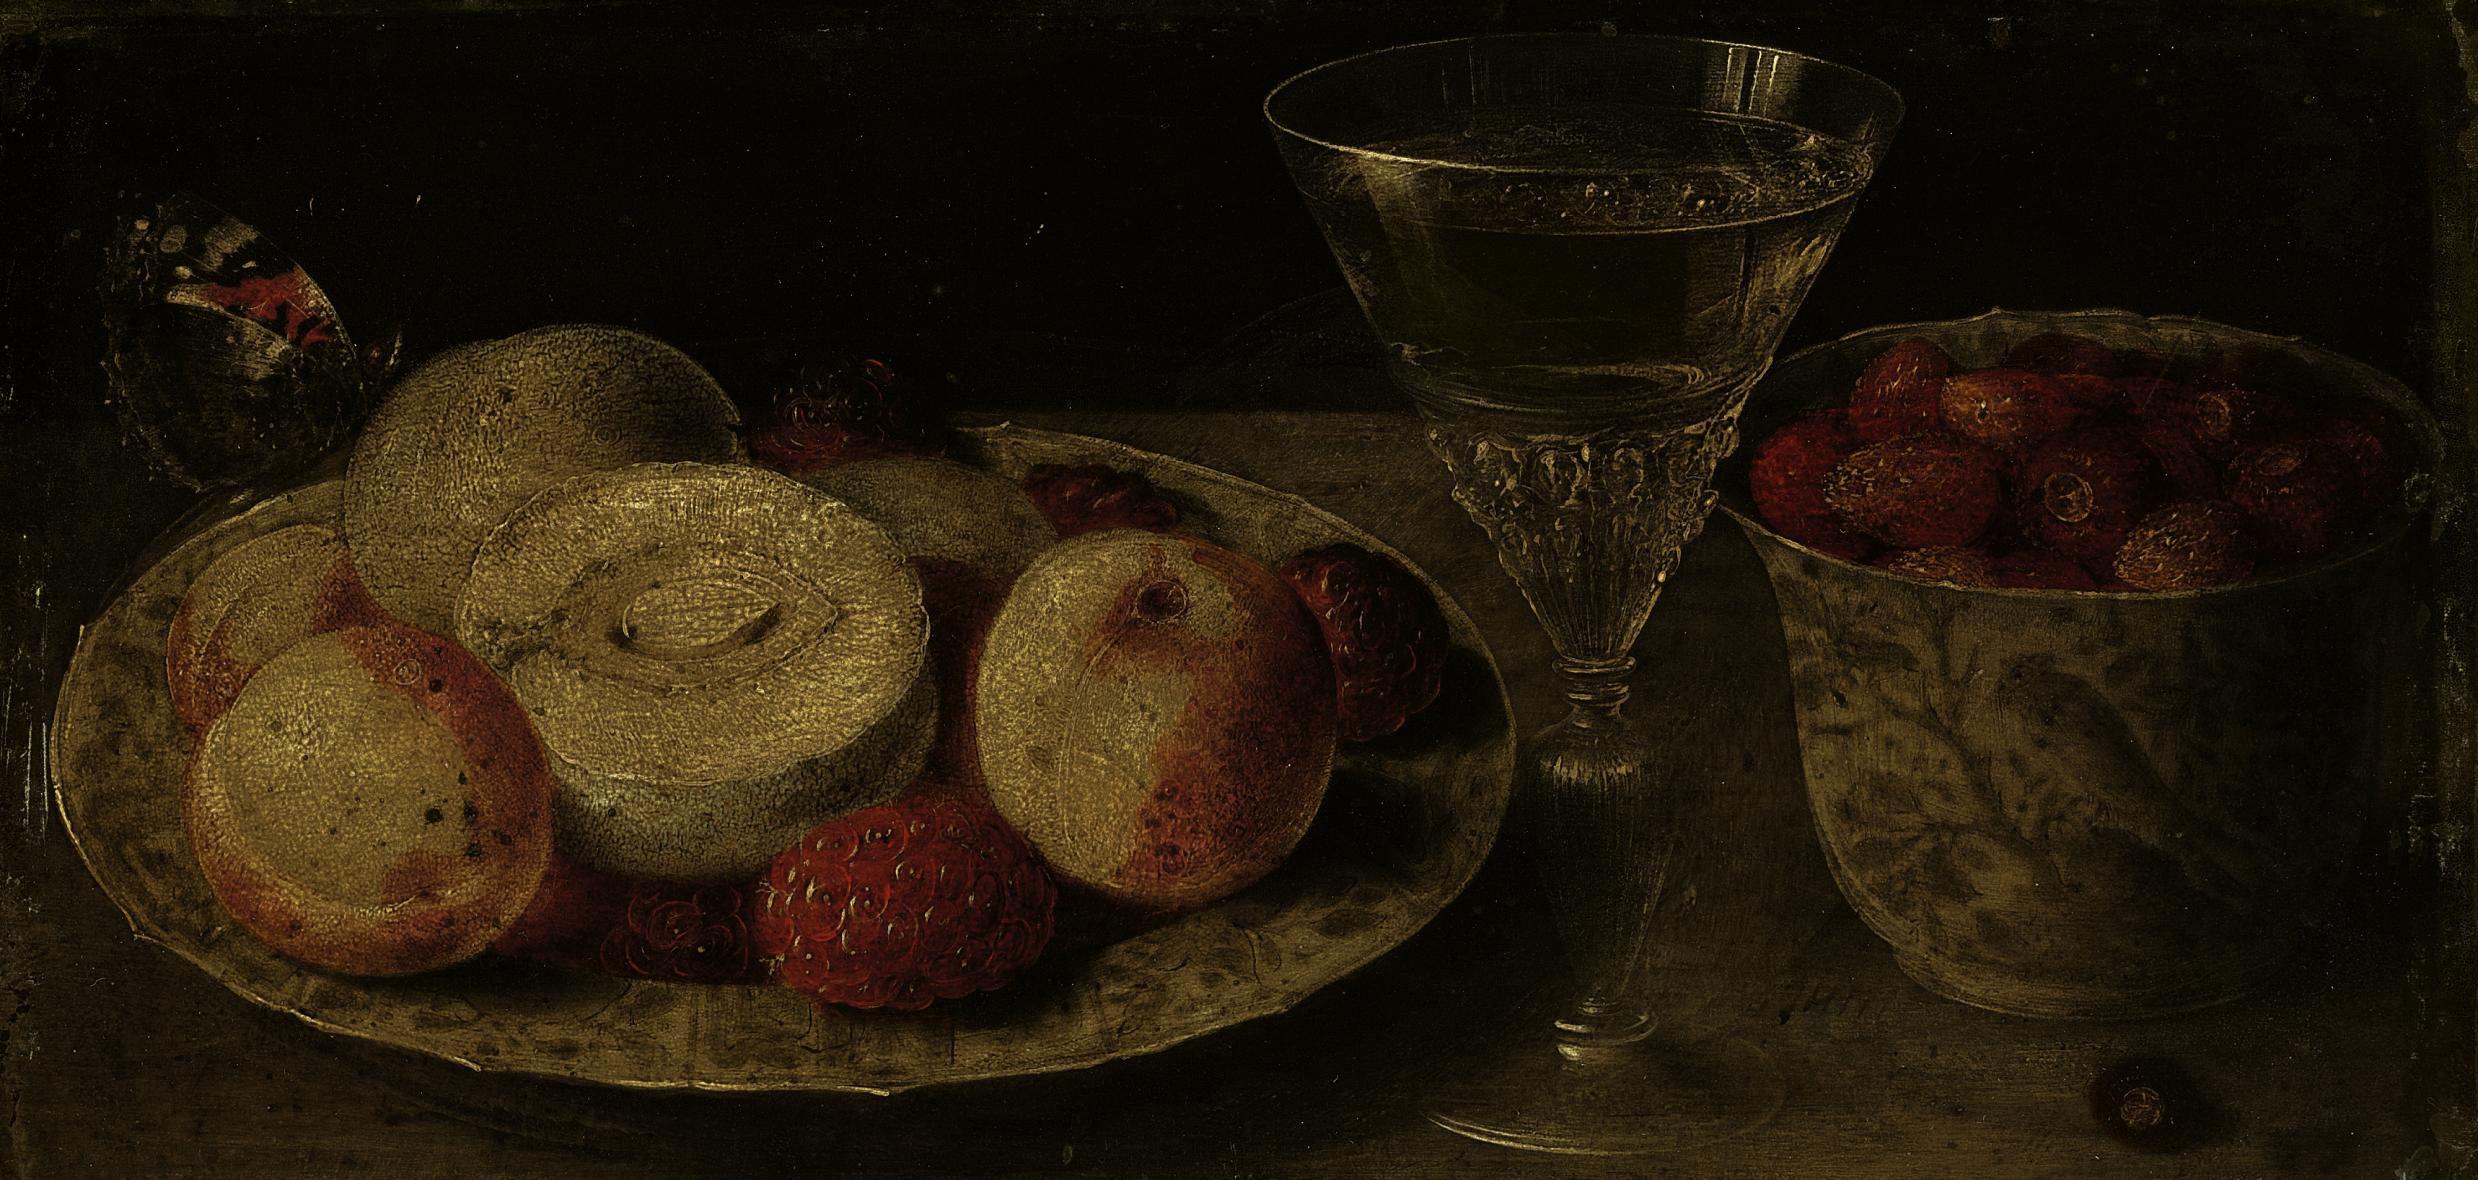 Peaches and raspberries on a wan-li kraak porcelain plate, with strawberries in a wan-li-krak porcelain beaker, with a glass of white wine on a tabletop